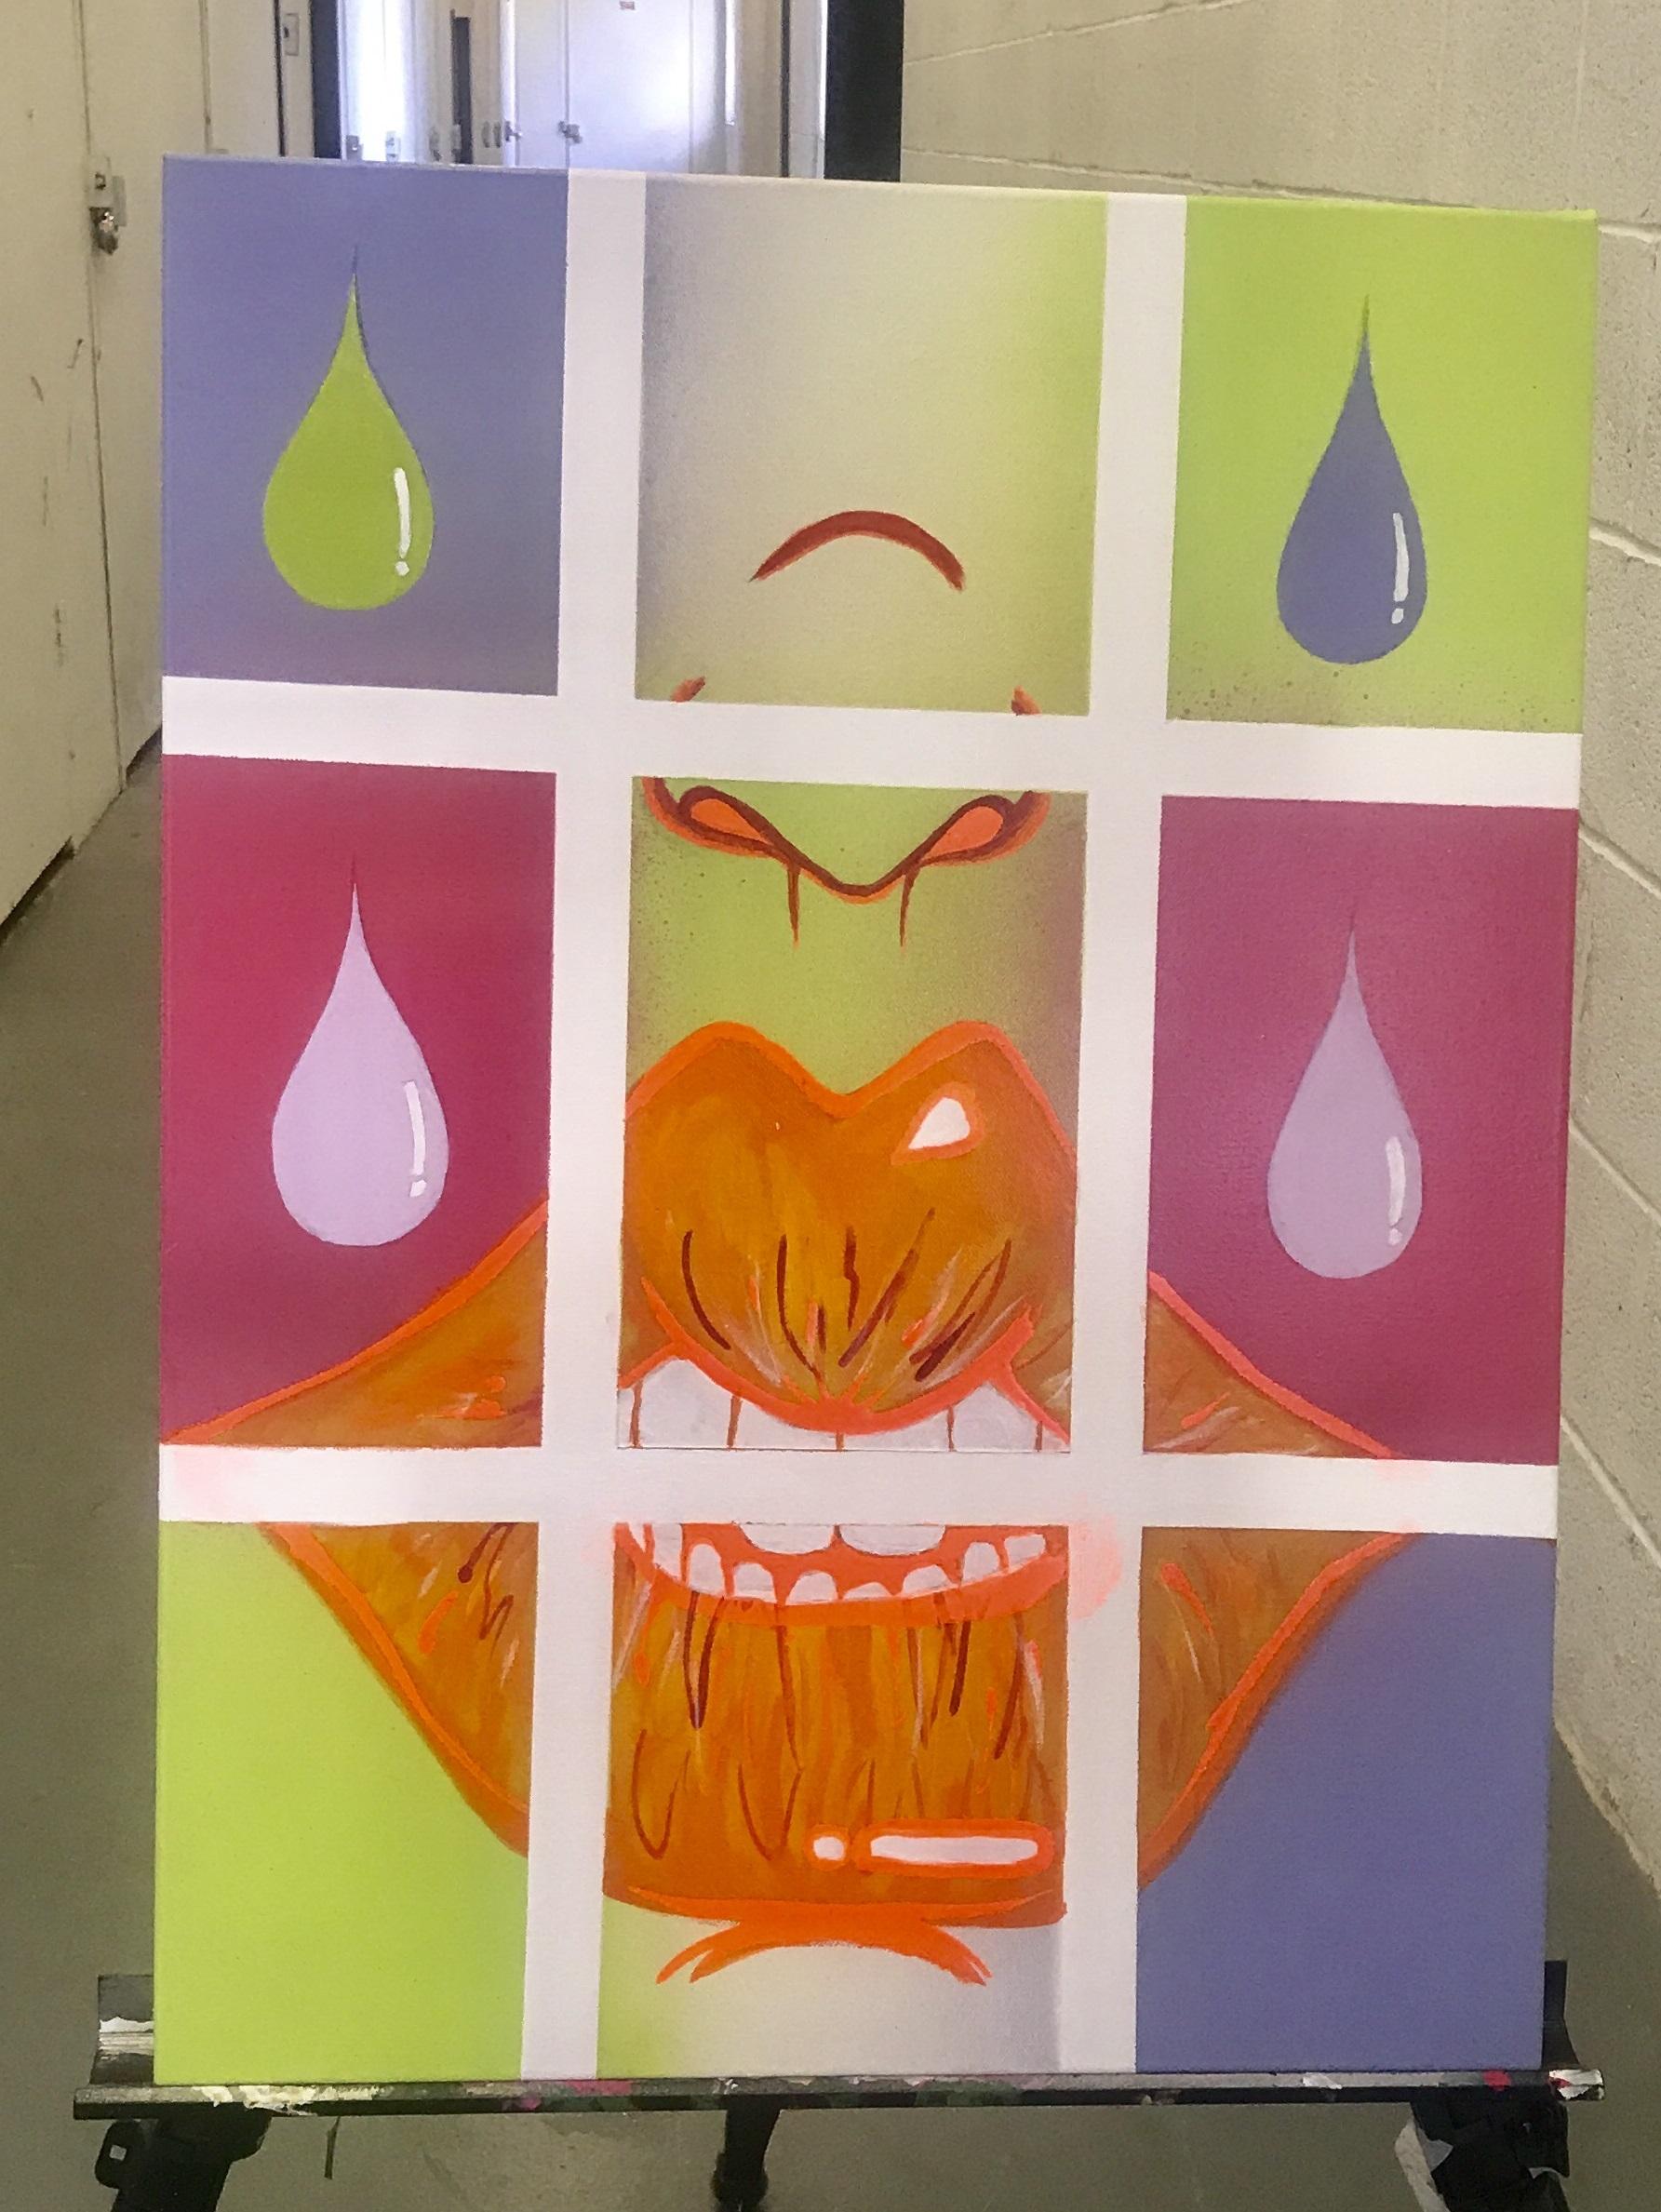 MIMI-Orange Resilience-Mixed Media on Canvas-18x24-$550.jpg